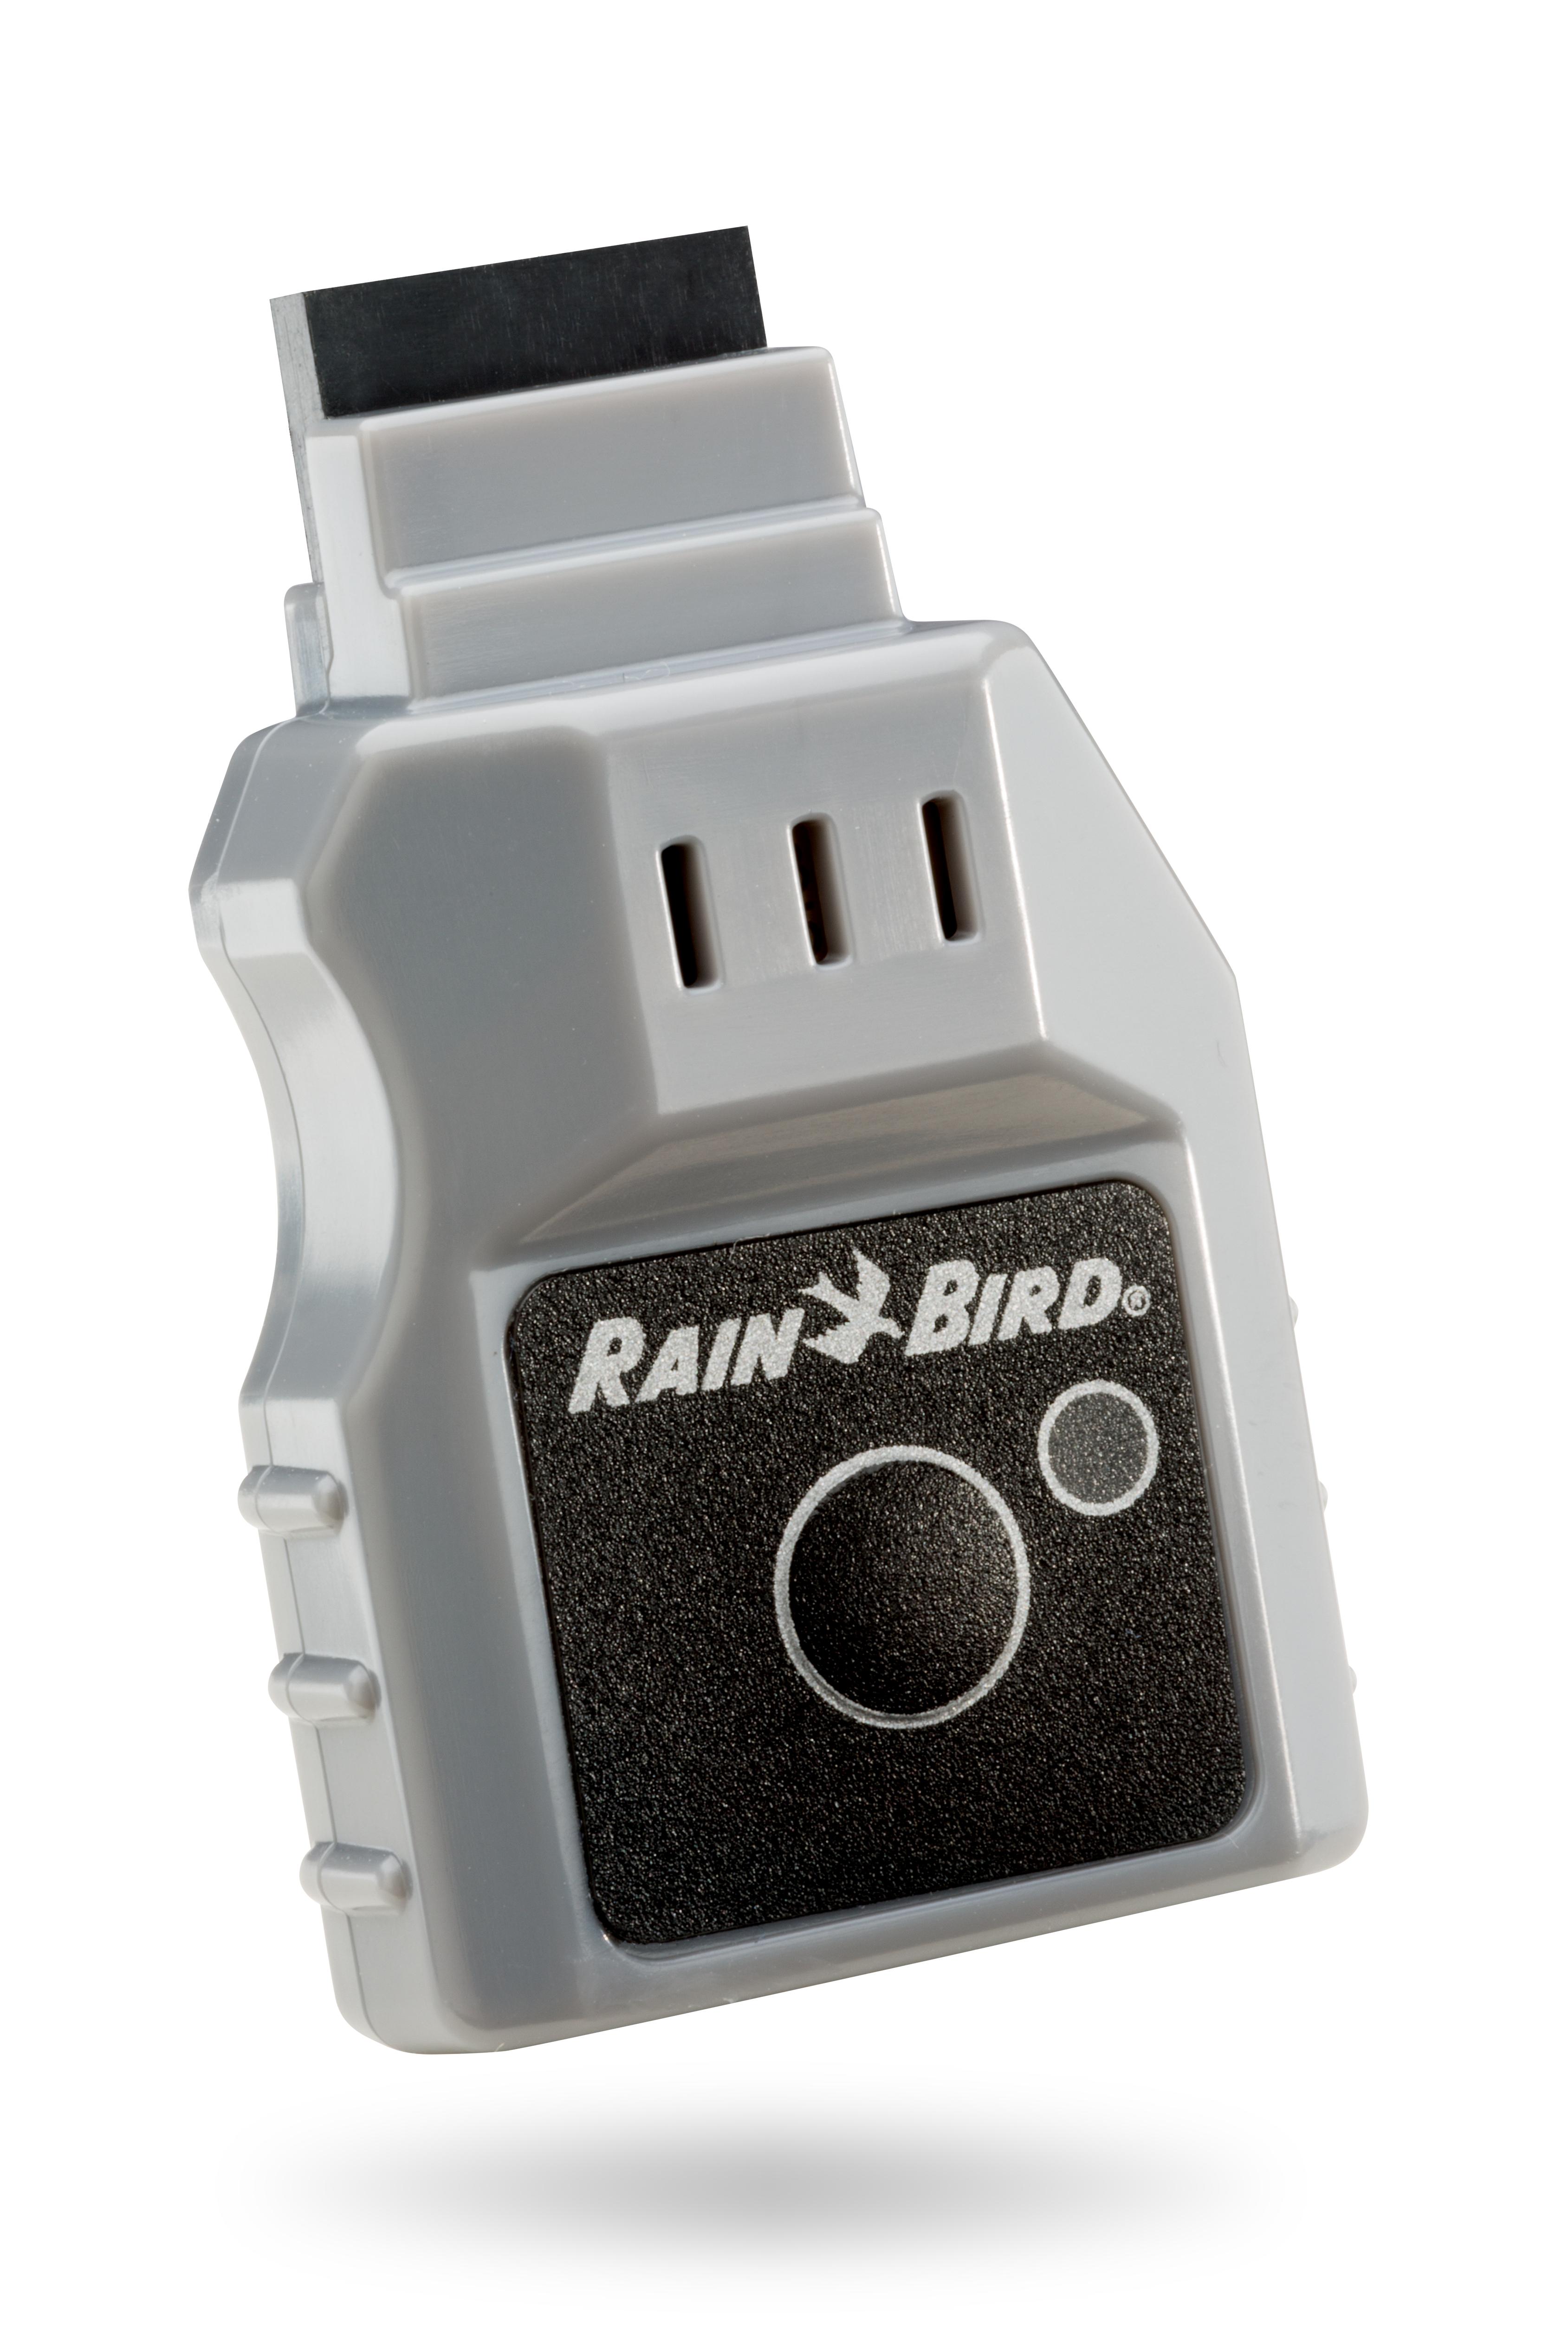 Rain Bird LNK-WiFimodule RZX, IESP4MEEUR